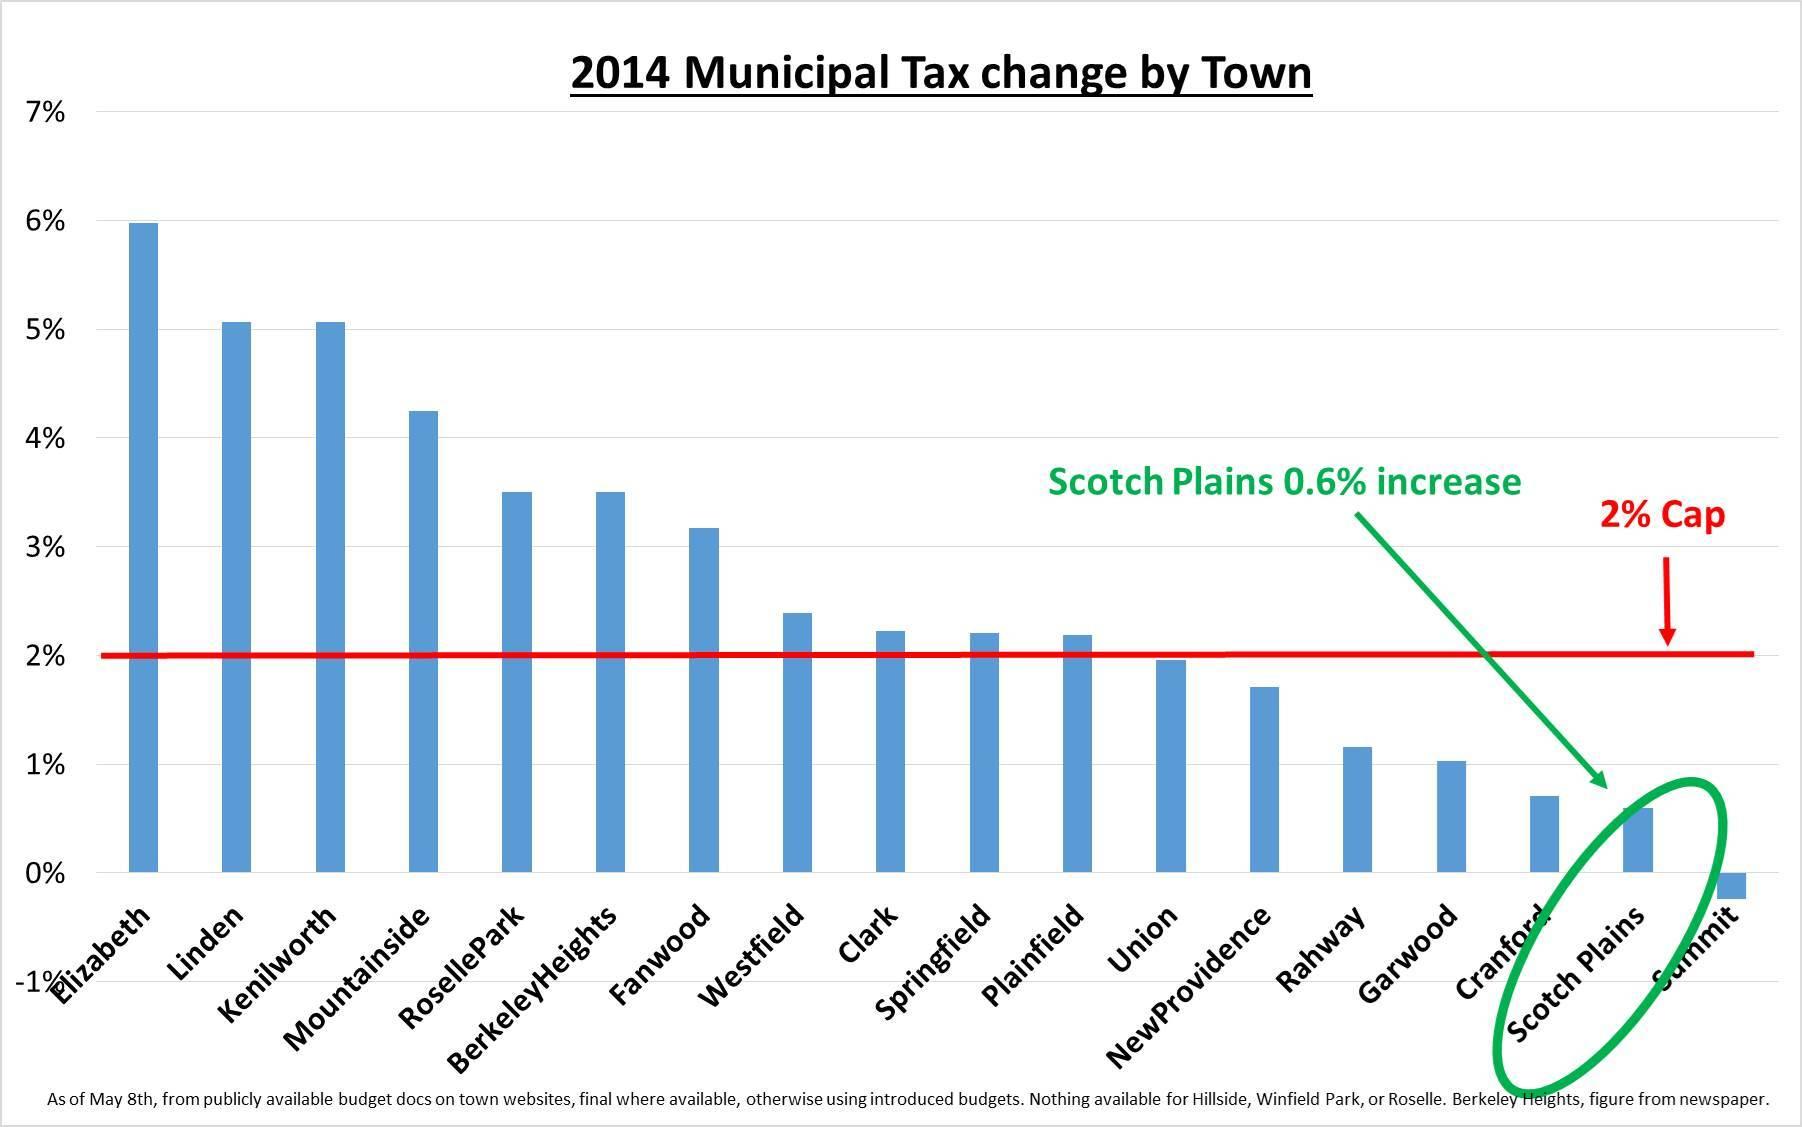 108c584234737c738055_LJ_Municipal_Tax_change_by_town.jpg